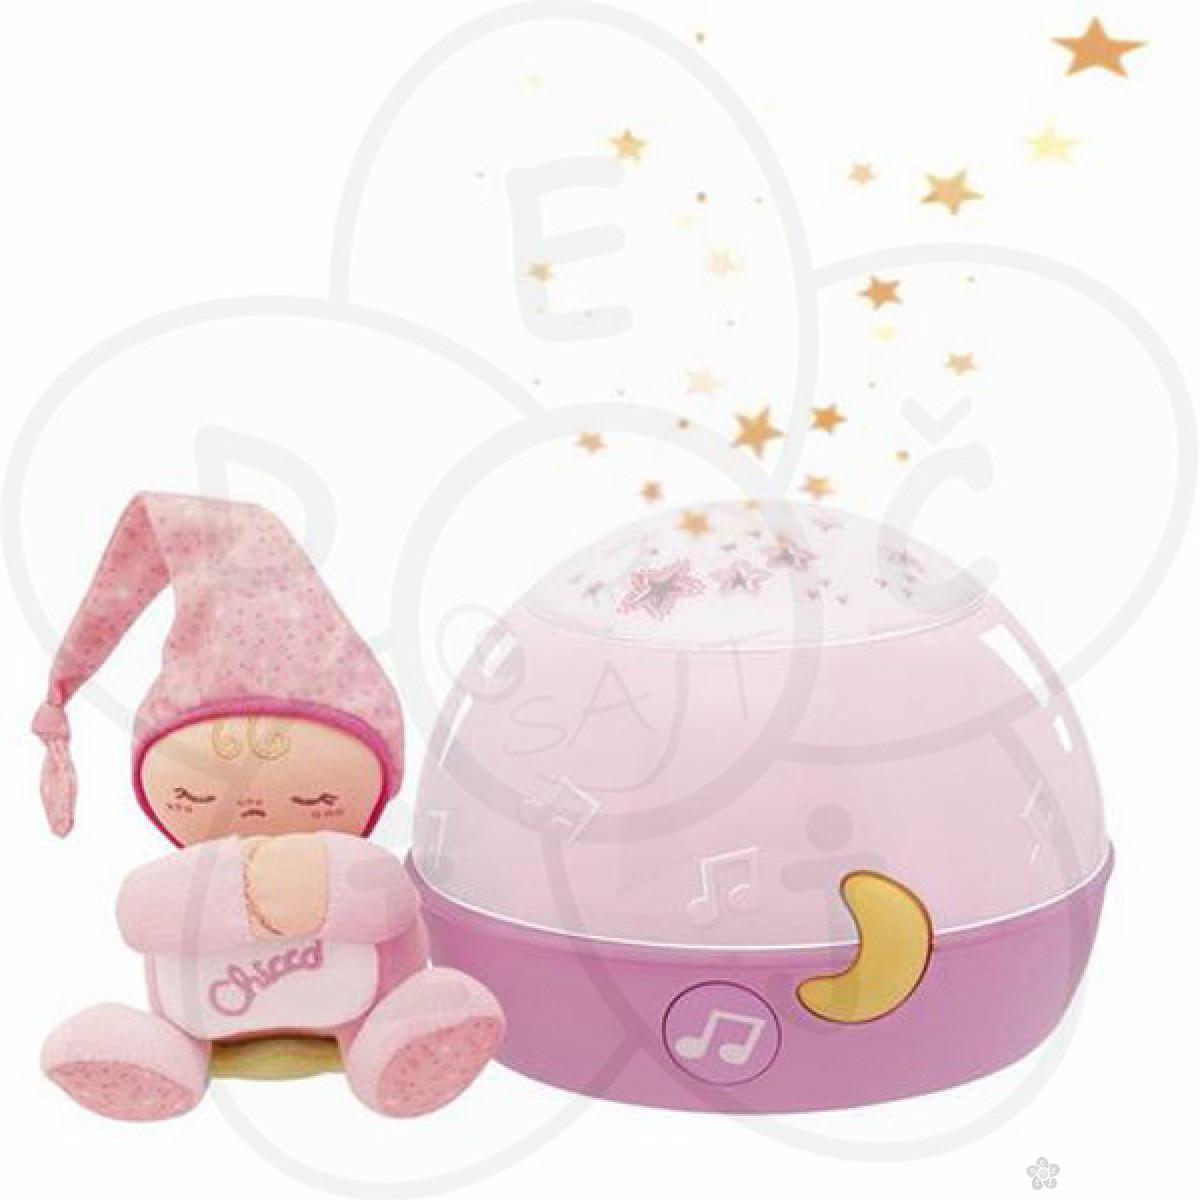 Chicco muzički projektor Uspavane zvezde (fd)-roze